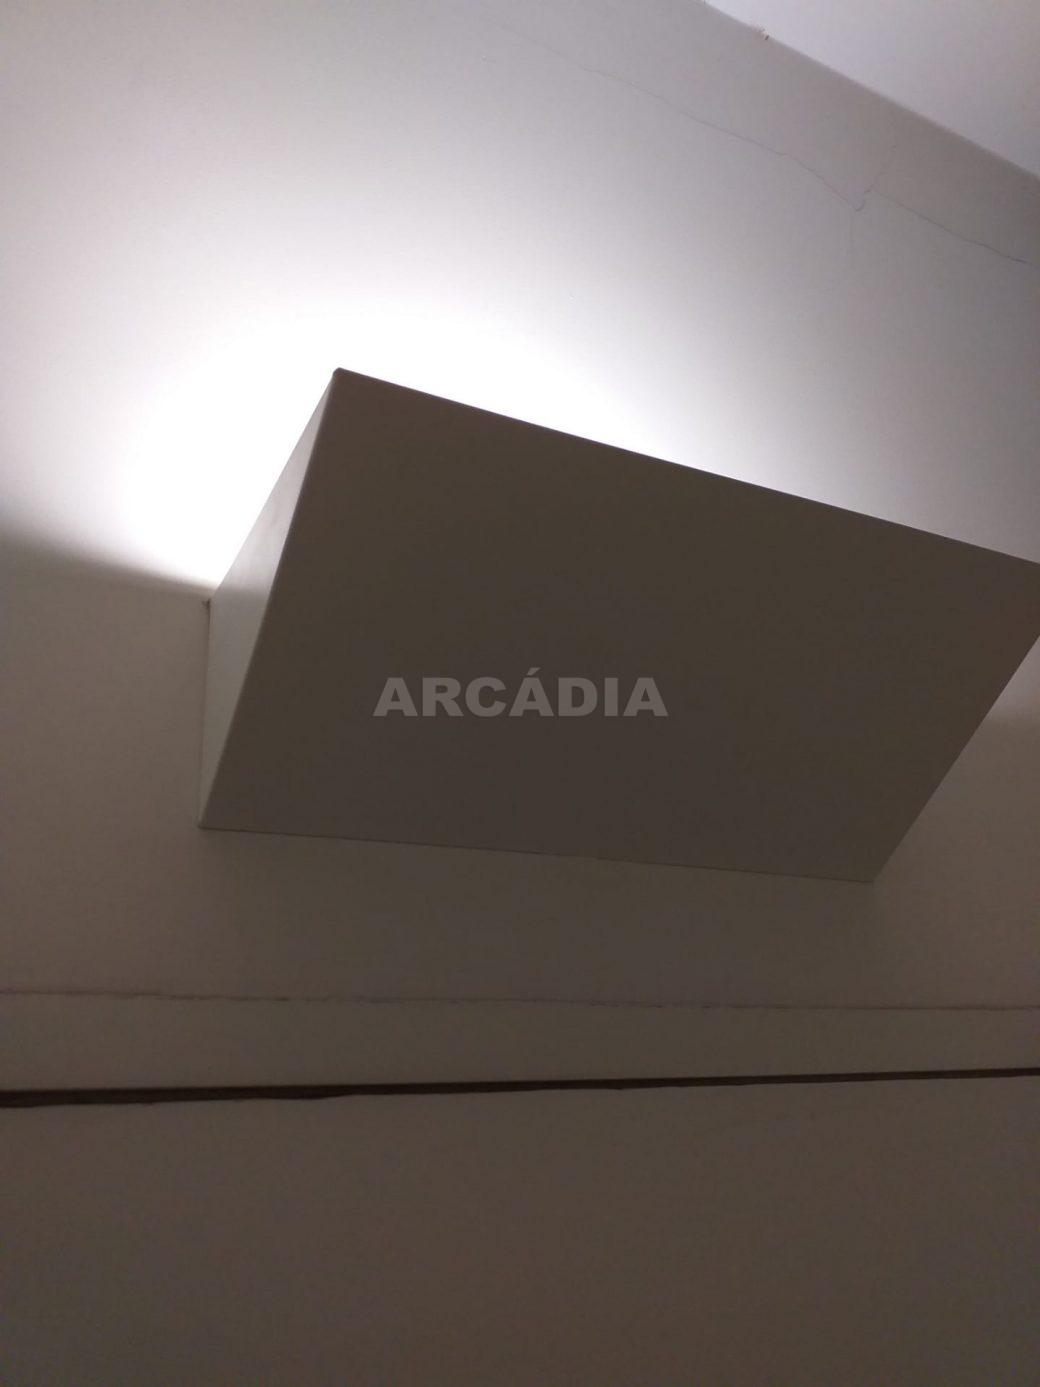 arcadia-imobiliaria-braga-apartamento-no-centro-historico-de-braga-tipo-2-para-compra-36